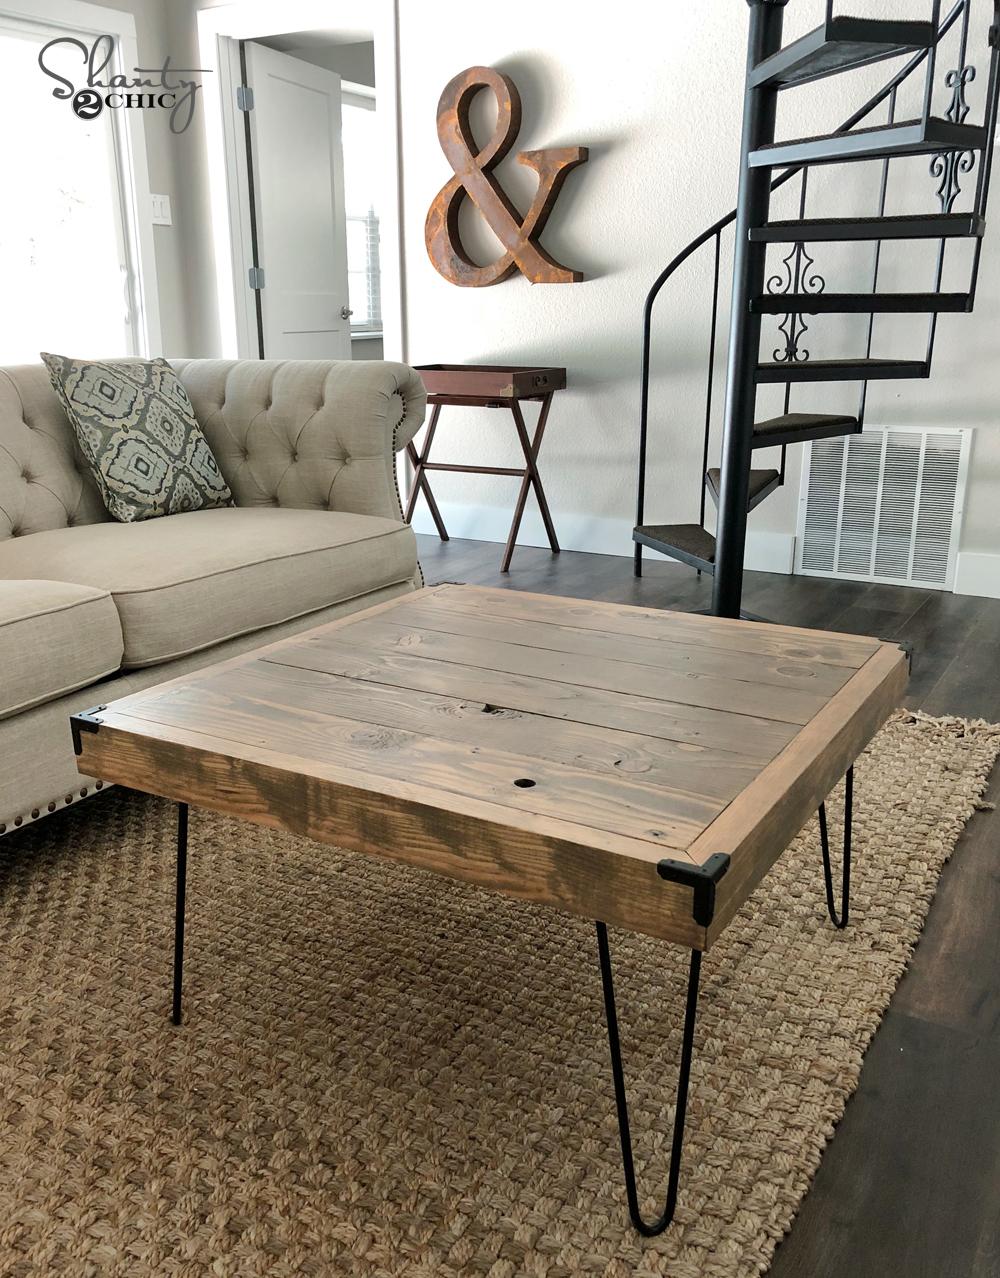 DIY $50 Square Hairpin Leg Coffee Table - Shanty 2 Chic